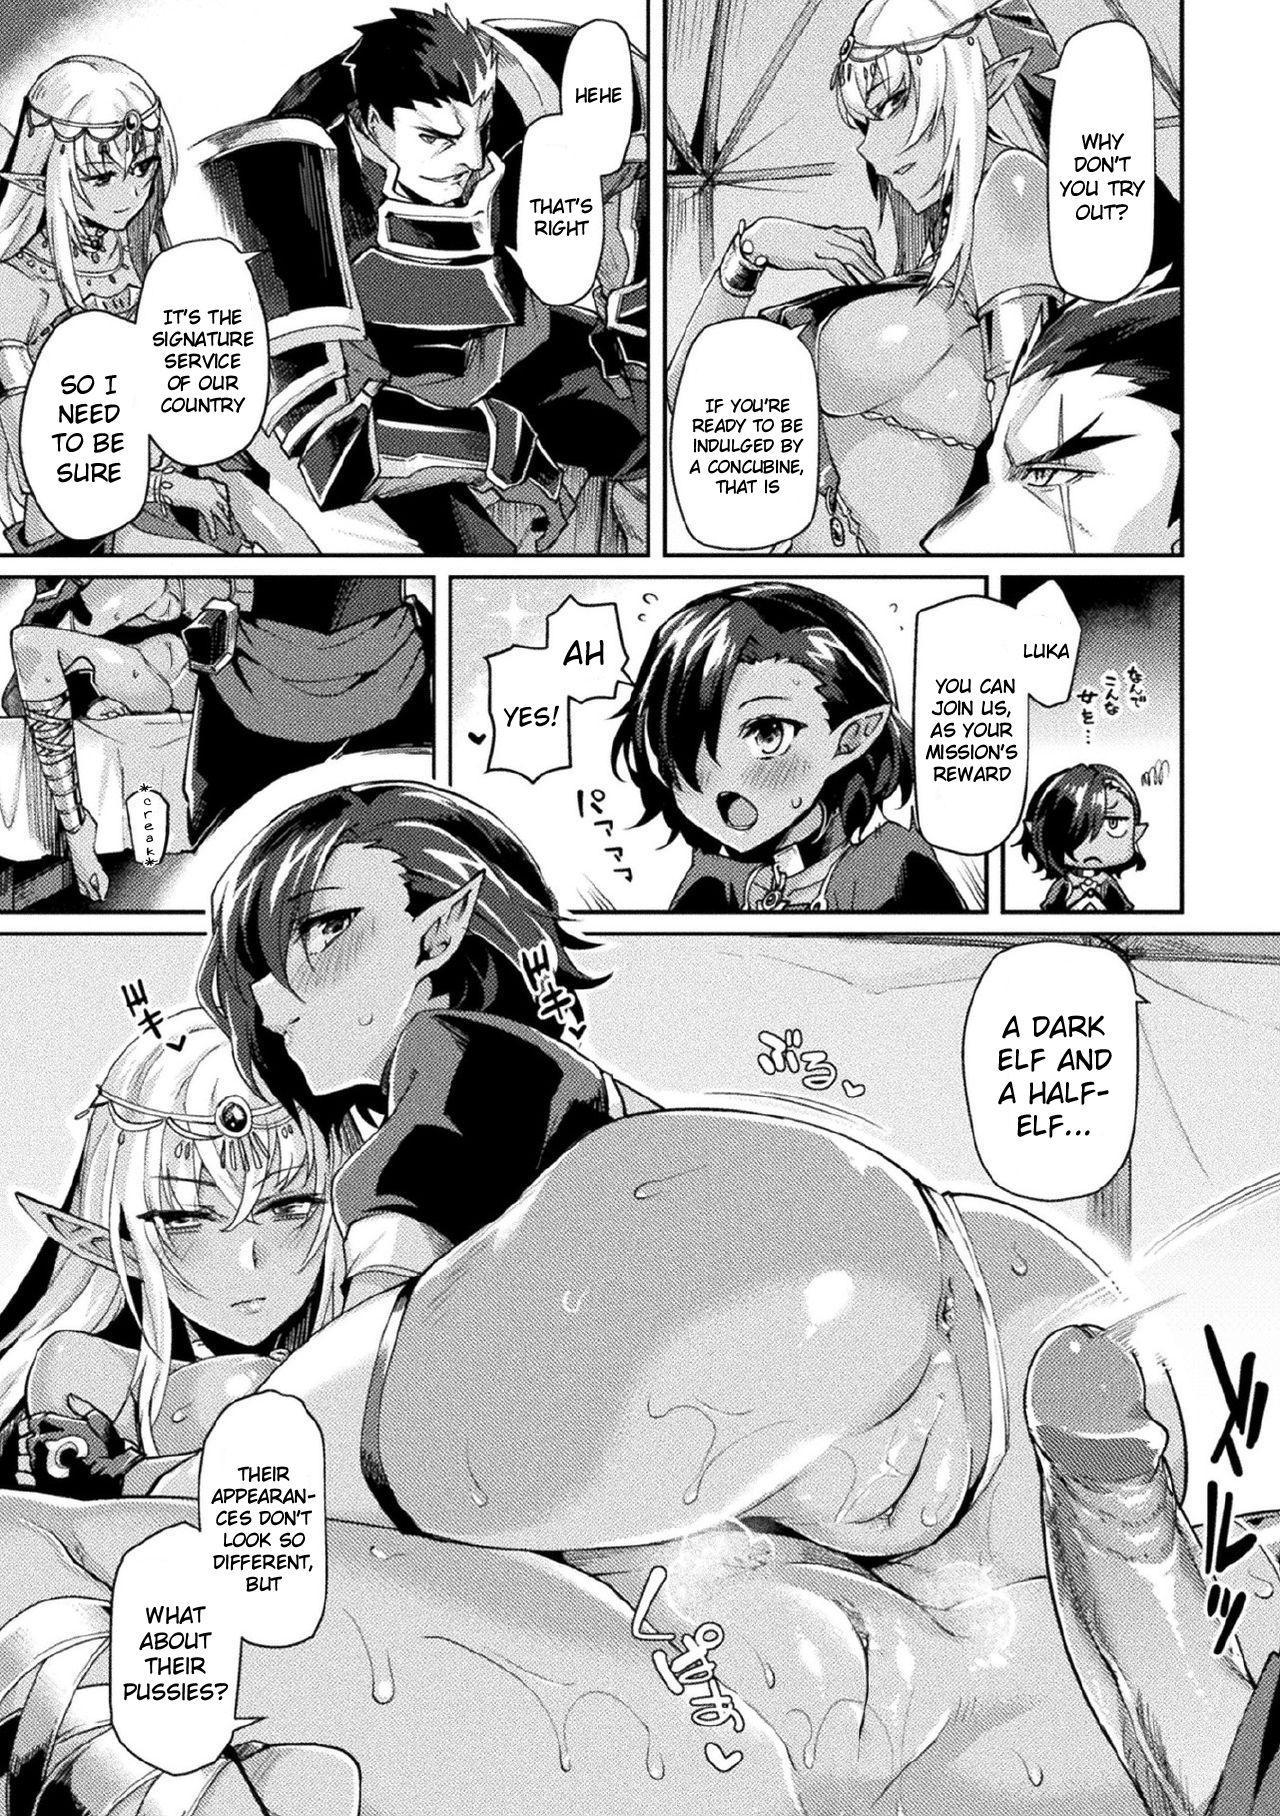 [Tsukitokage] Kuroinu II ~Inyoku ni Somaru Haitoku no Miyako, Futatabi~ THE COMIC Chapter 6 (Kukkoro Heroines Vol. 7) [English] [Klub Kemoner] [Decensored] [Digital] 6